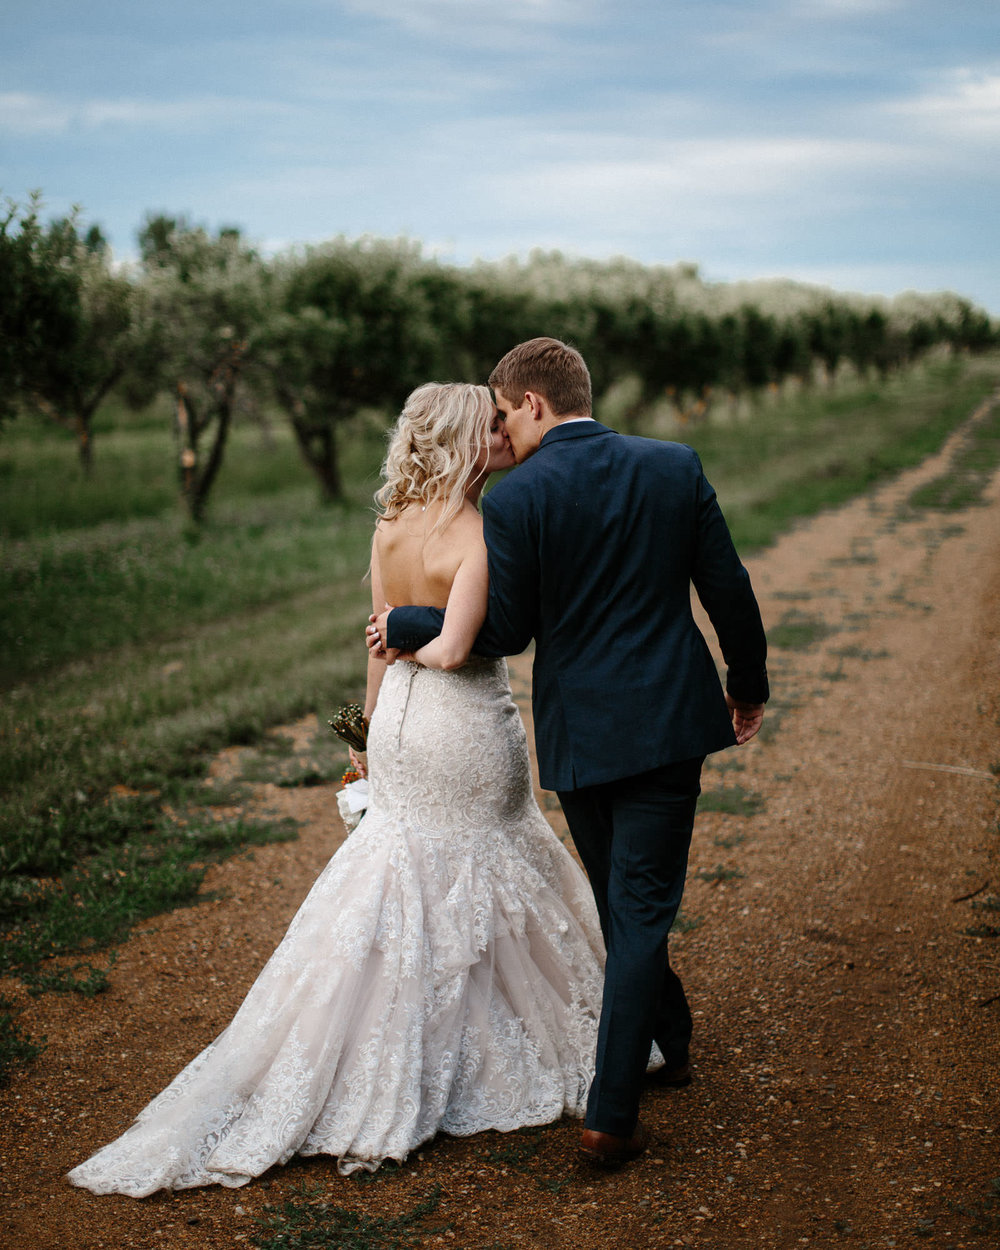 meadow-barn-wedding-sioux-falls-south-dakota-romantic-adventerous-michael-liedtke-photography091.jpg